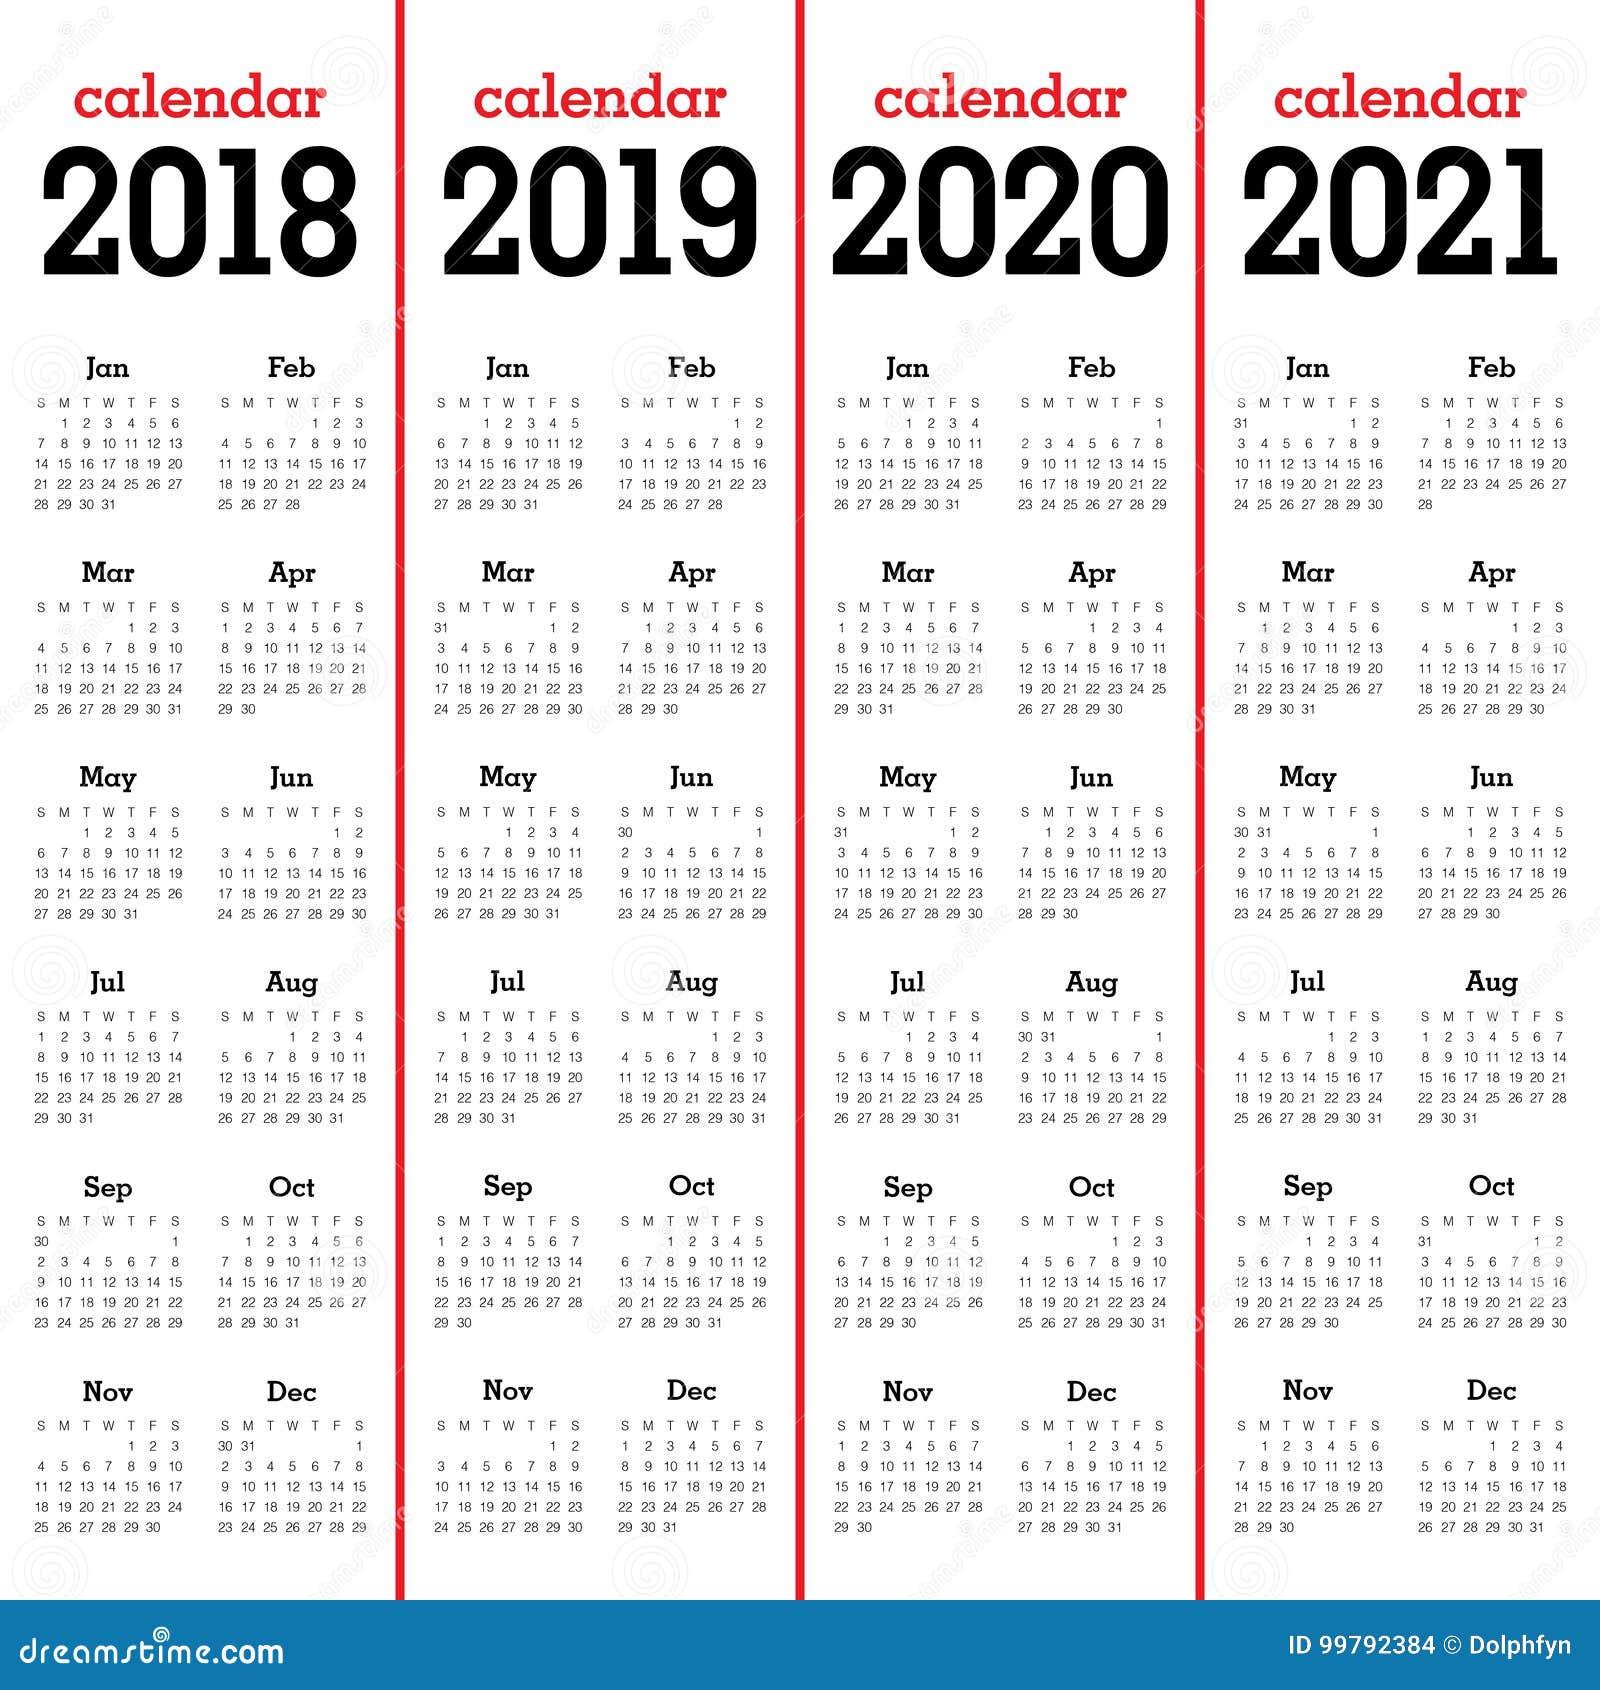 year 2018 2019 2020 2021 calendar vector